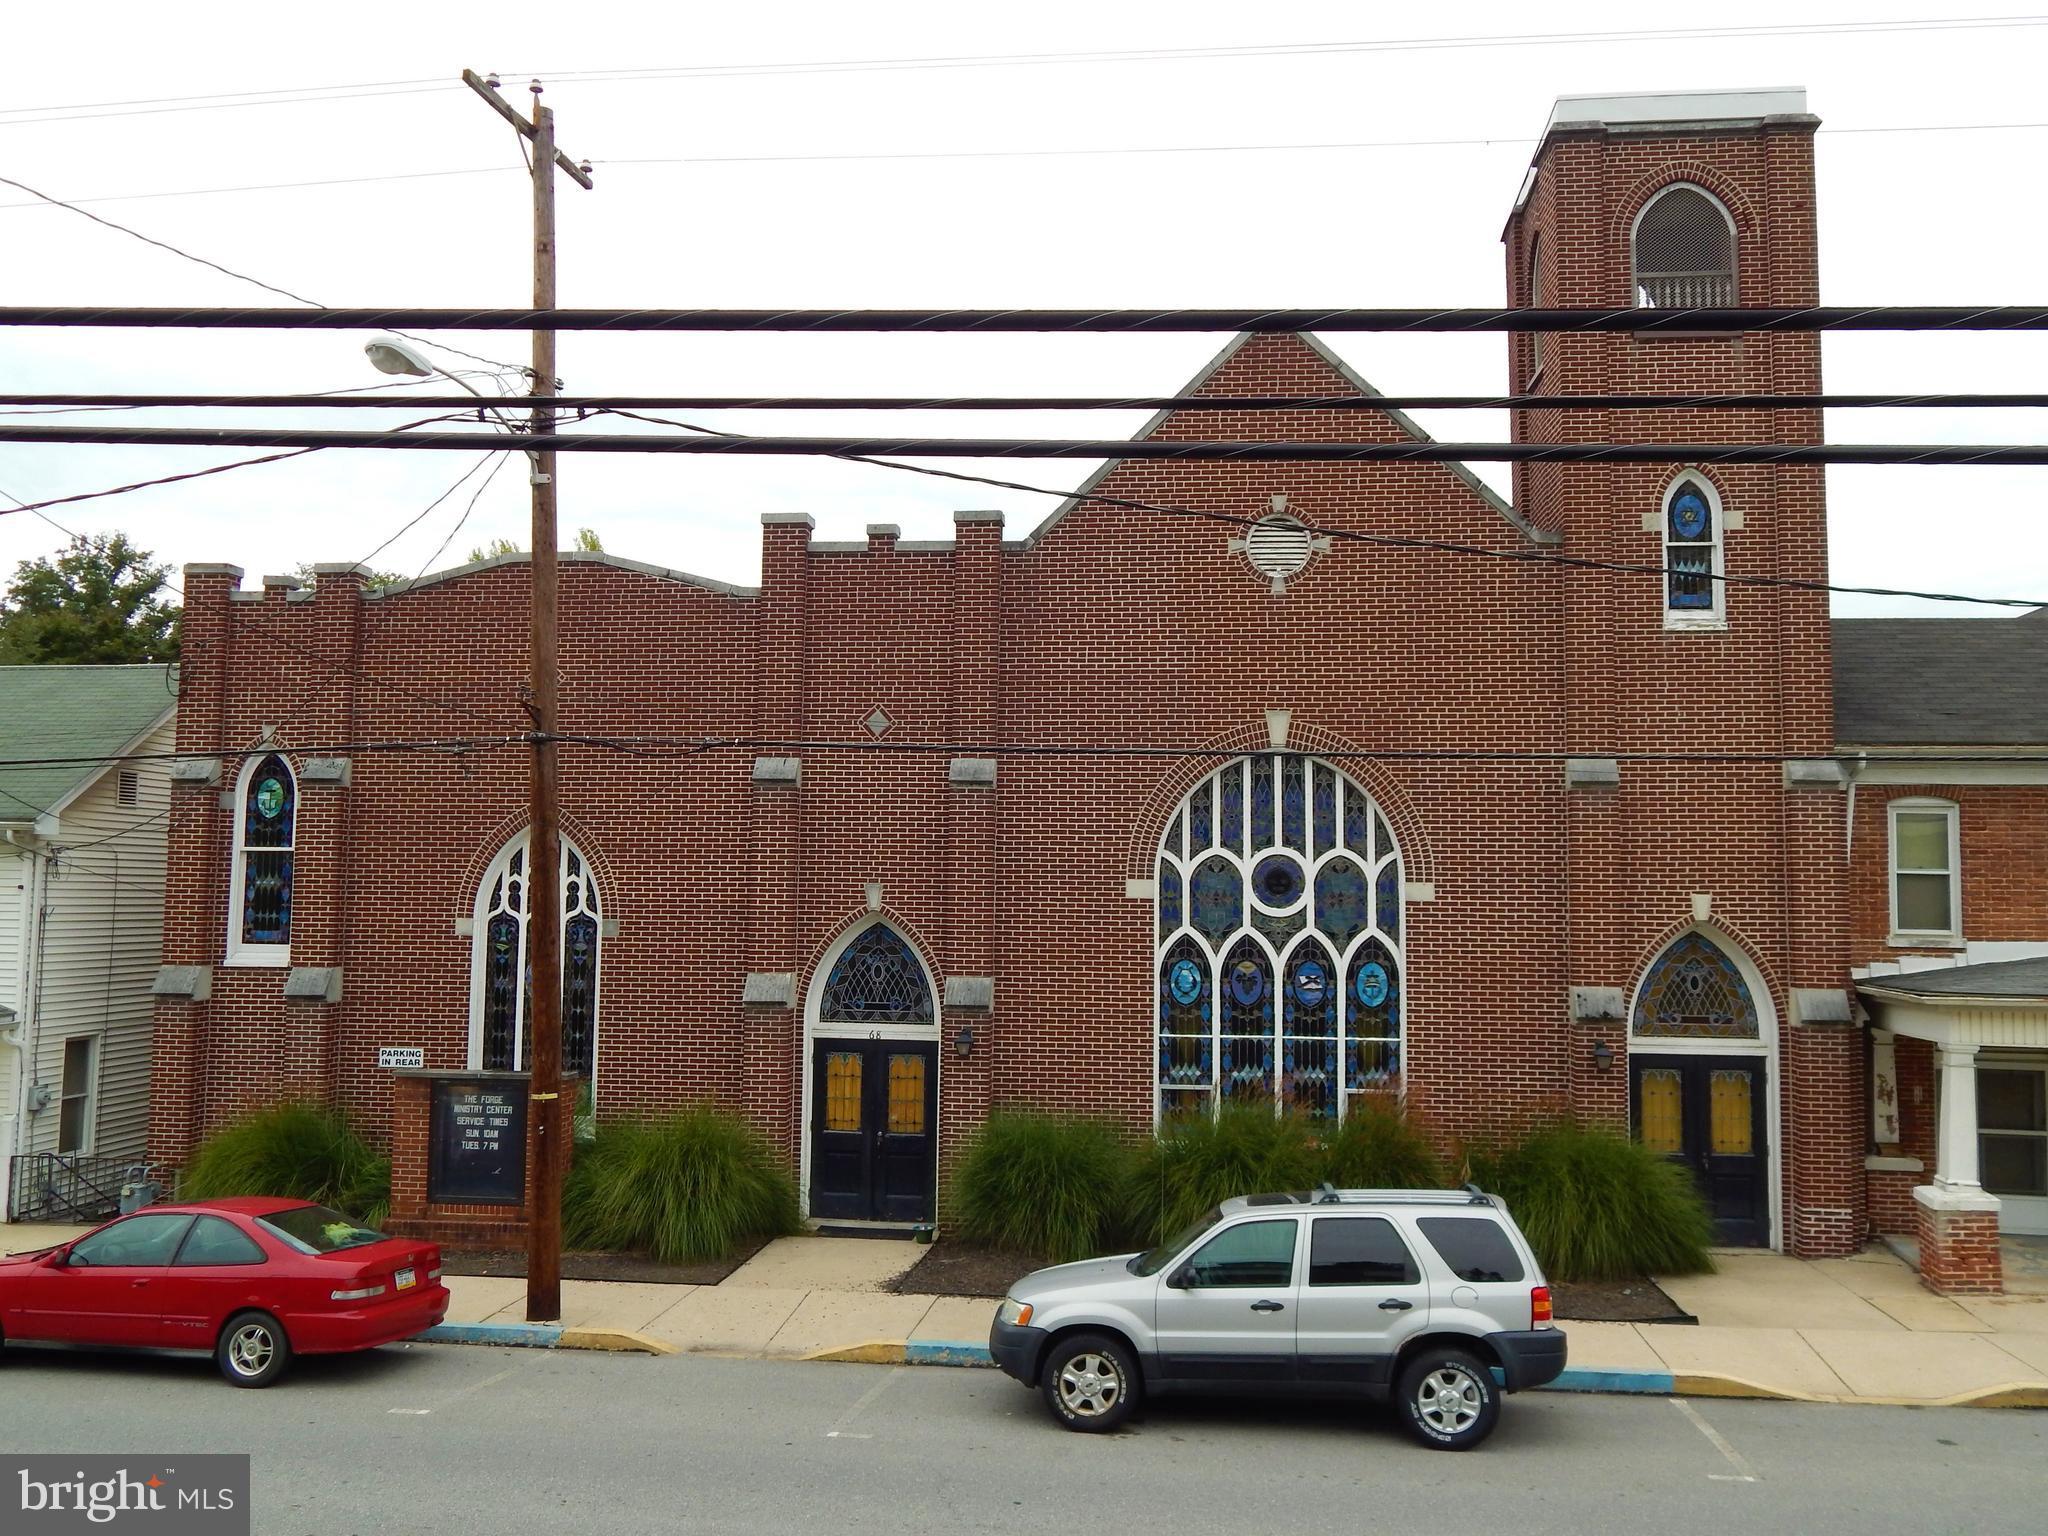 68 W MAIN STREET, WINDSOR, PA 17366